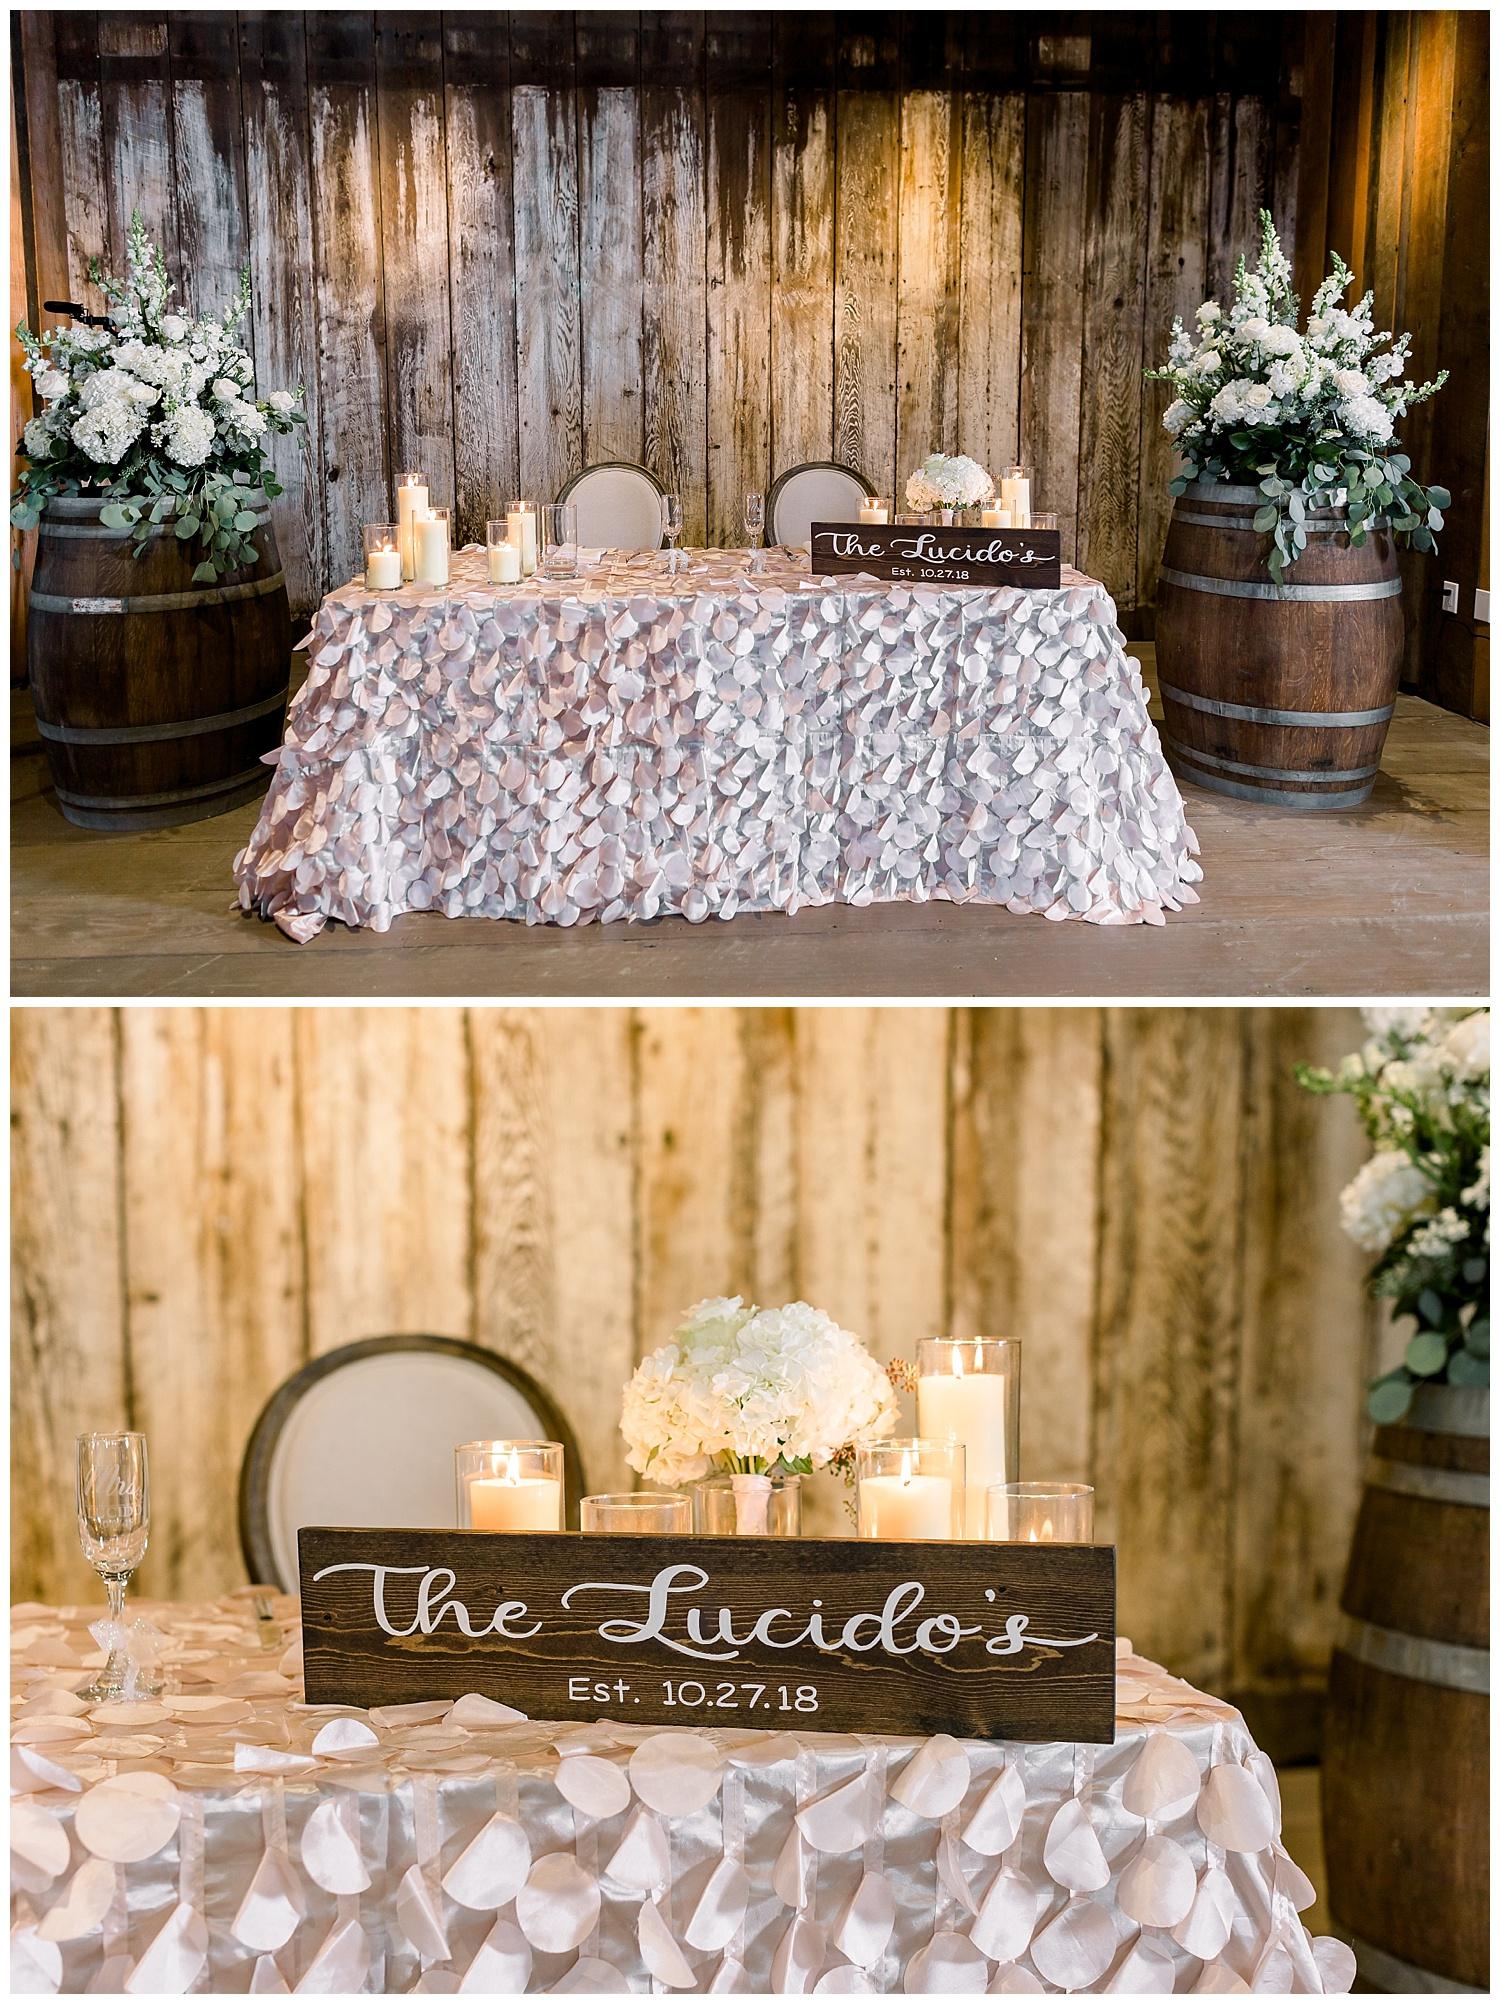 the-barns-cooper-molera-sweetheart-table-details-ags-photoart.jpg